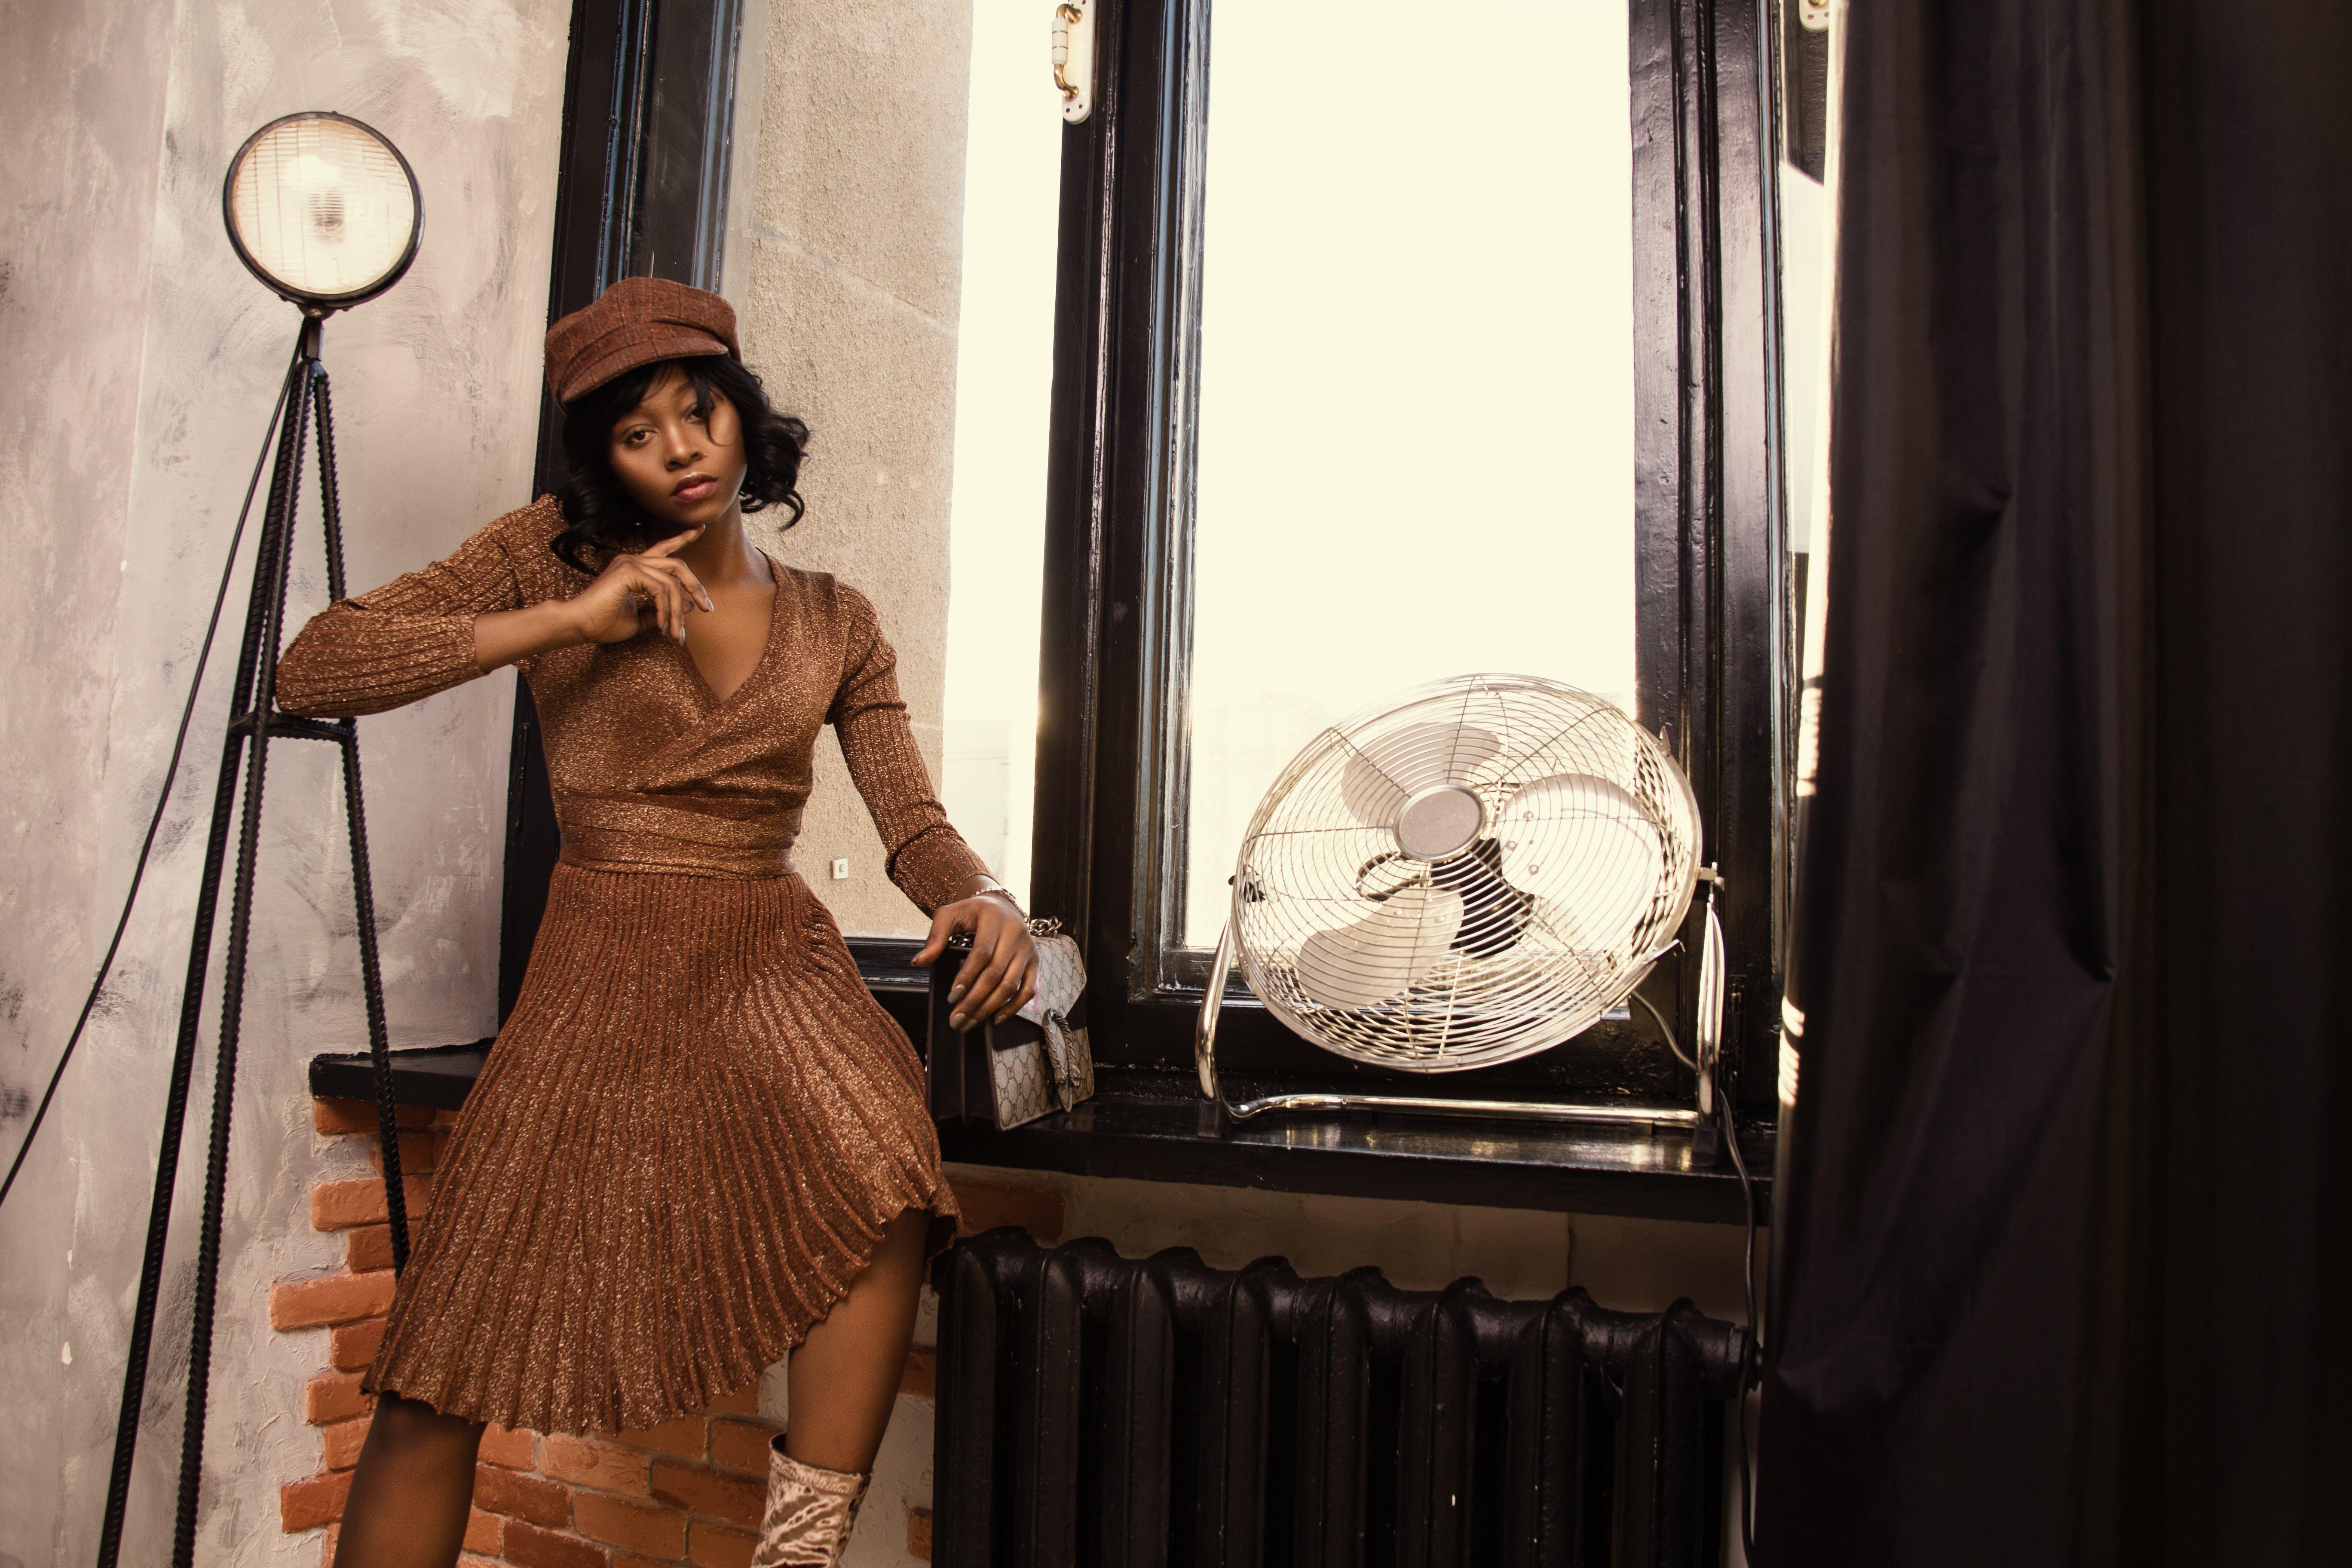 Woman Wearing Brown Dress Near Fan Standing Beside Table at Daytime